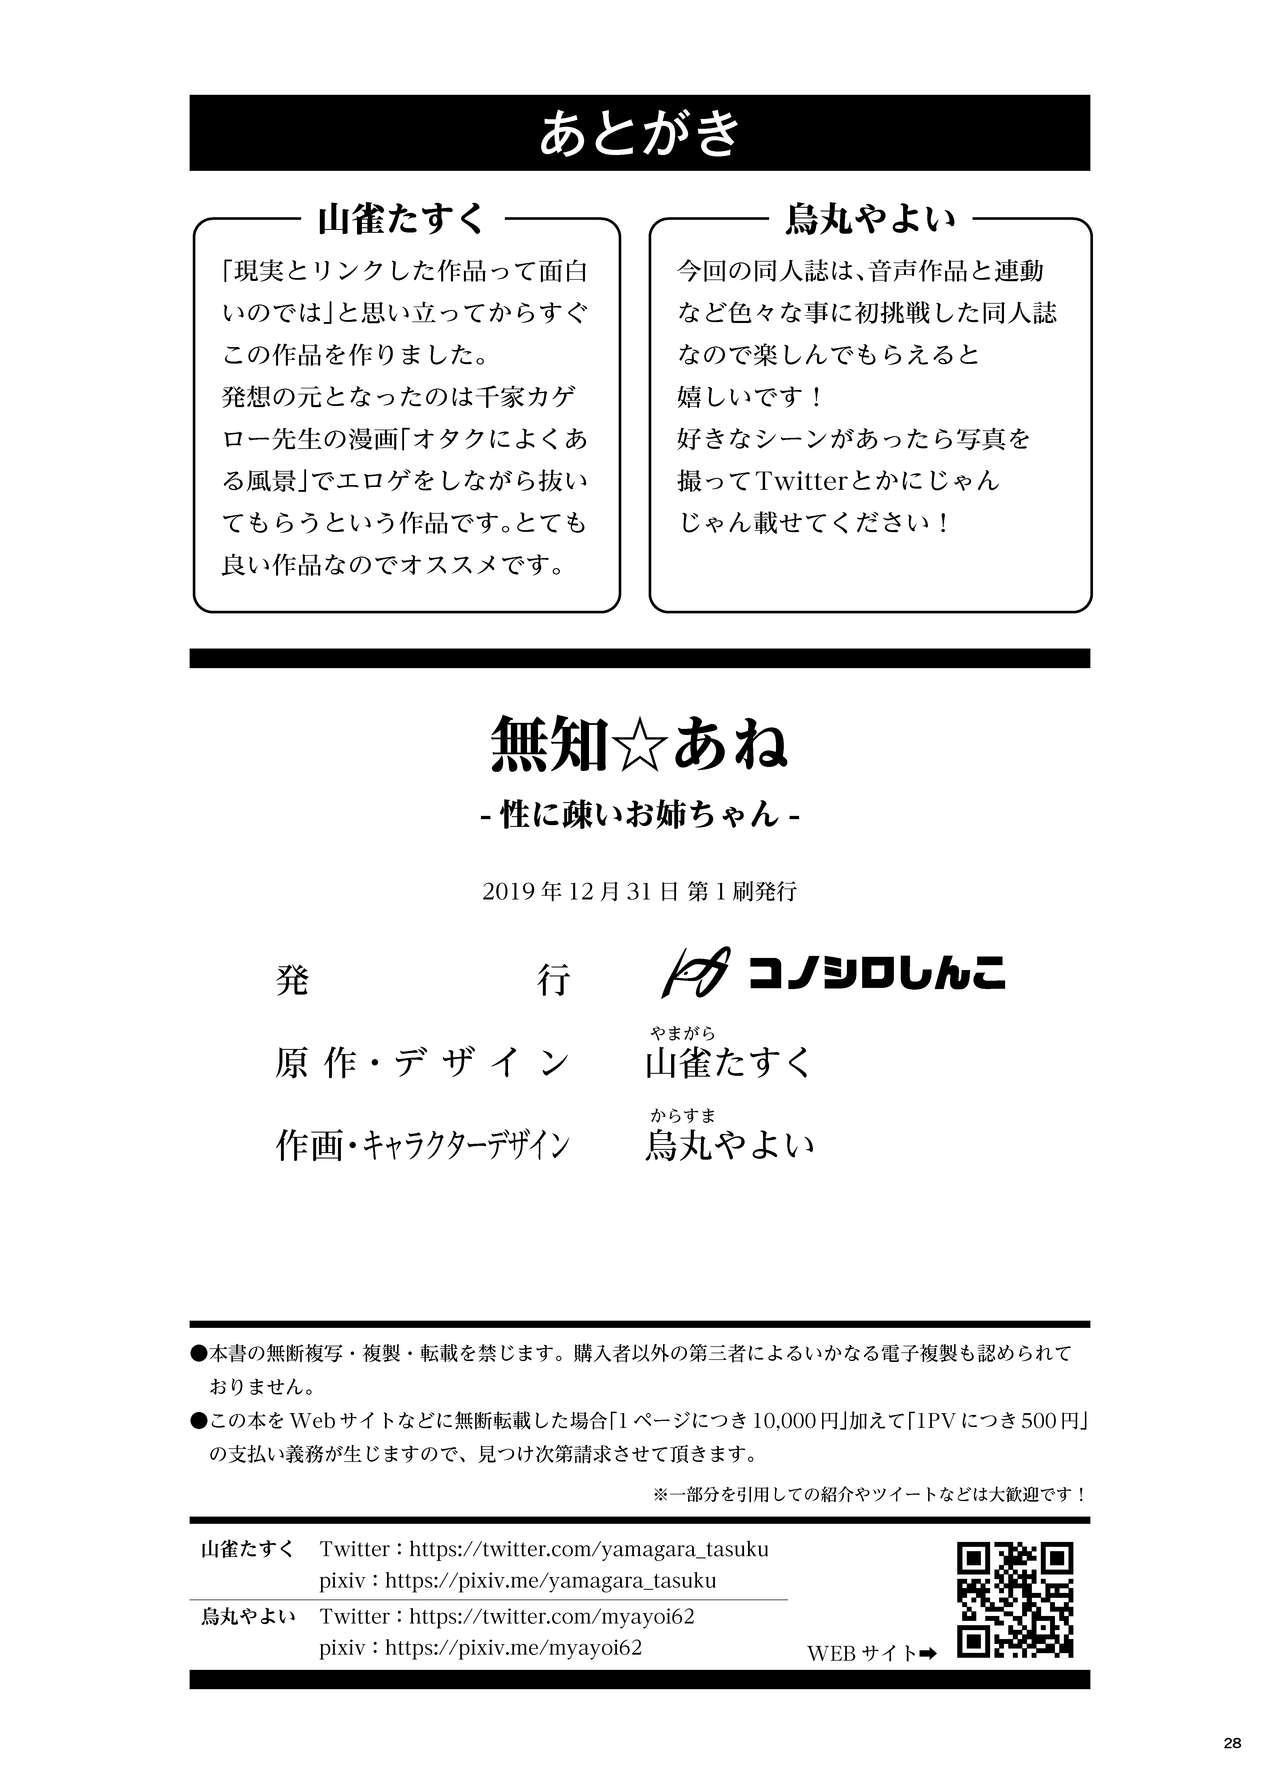 (C97) [Konoshiro Shinko (Yamagara Tasuku, Karasuma Yayoi)] Muchi Ane -Sei ni Utoi Onee-chan- | Innocent☆Sister -My Onee-chan Is a Stranger to Sex- [English] [Nisor] 26